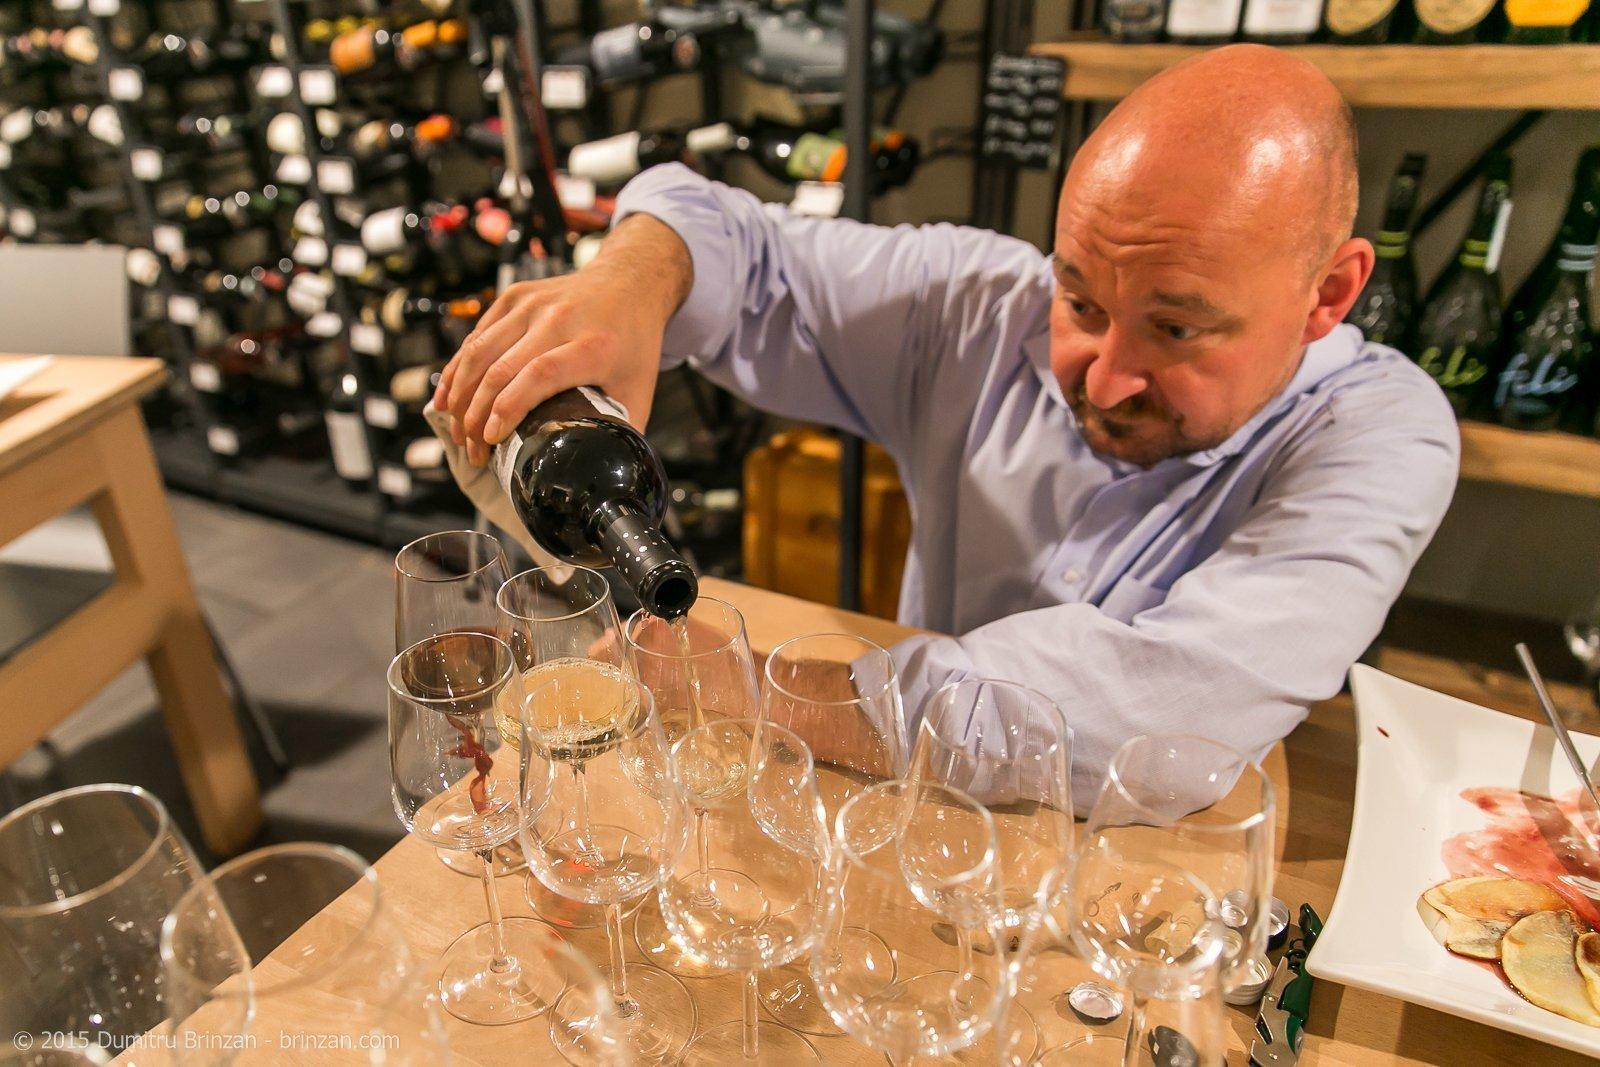 weinadvokat-dortmund-moldovan-wines-2015-14-illustro